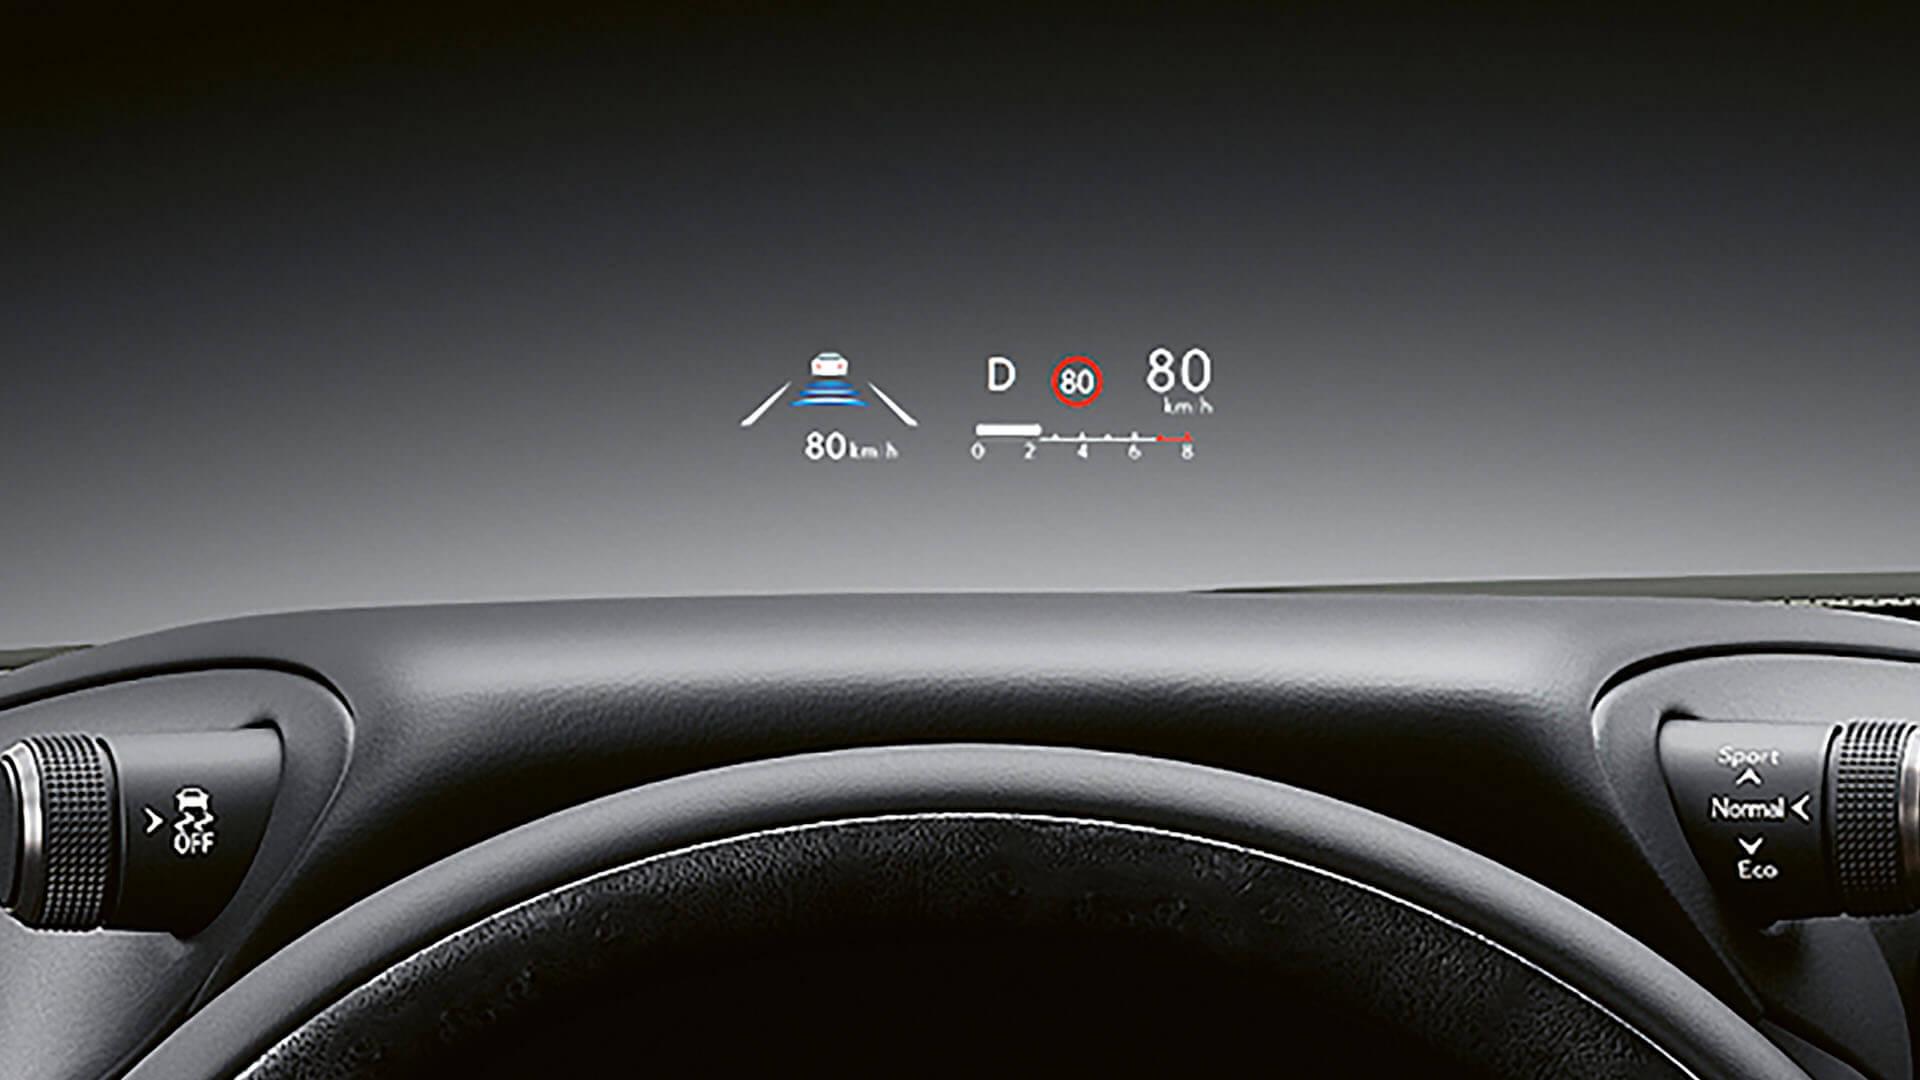 2022 lexus es experience interior front head up display